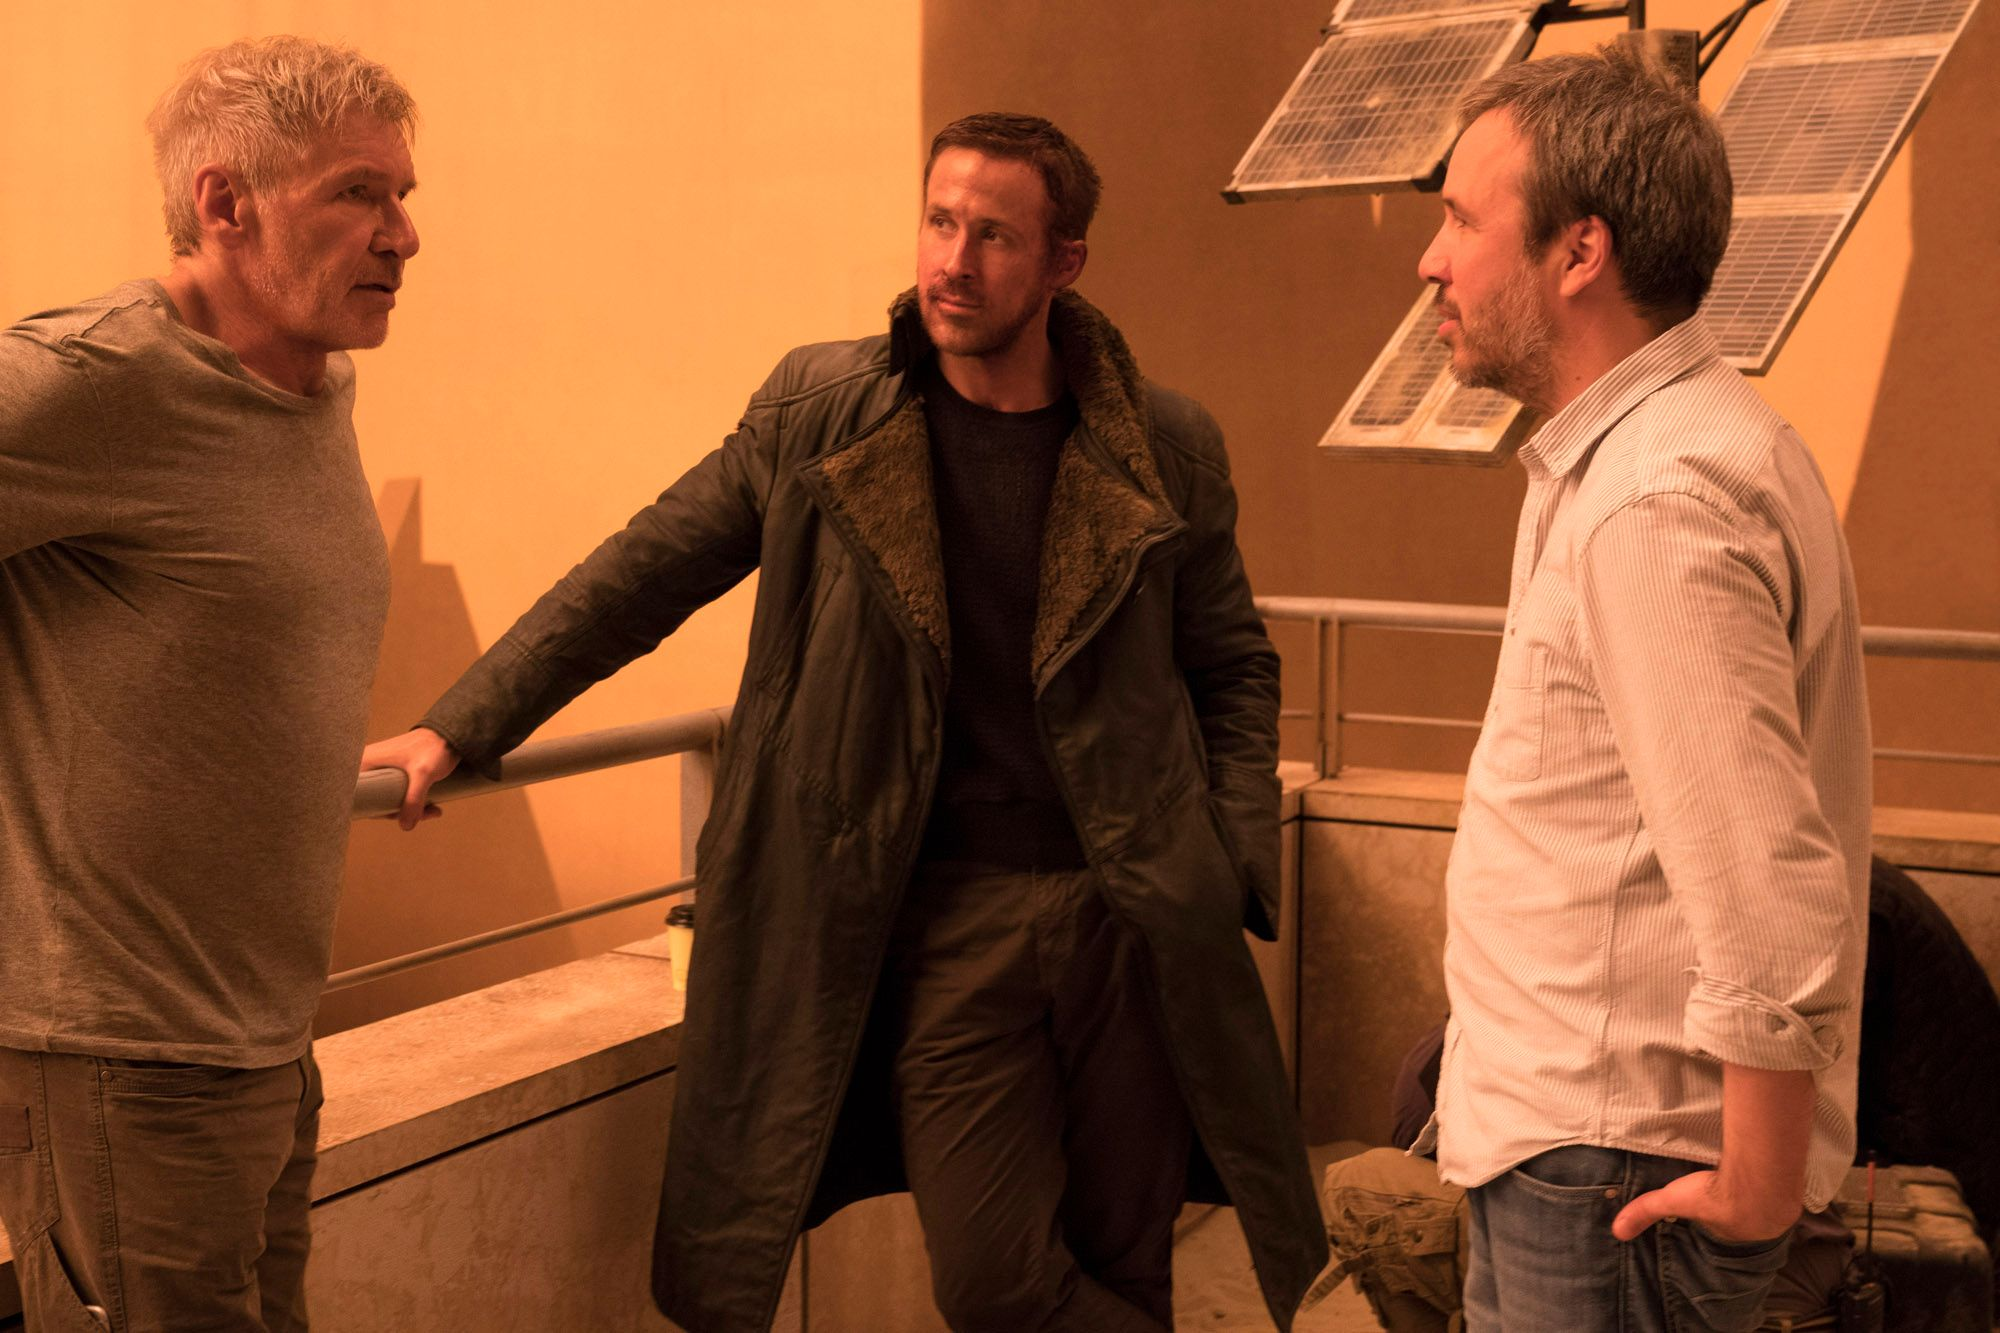 Rian Johnson & Denis Villeneuve Talk 'Blade Runner 2049' in Spoiler-Filled Conversation